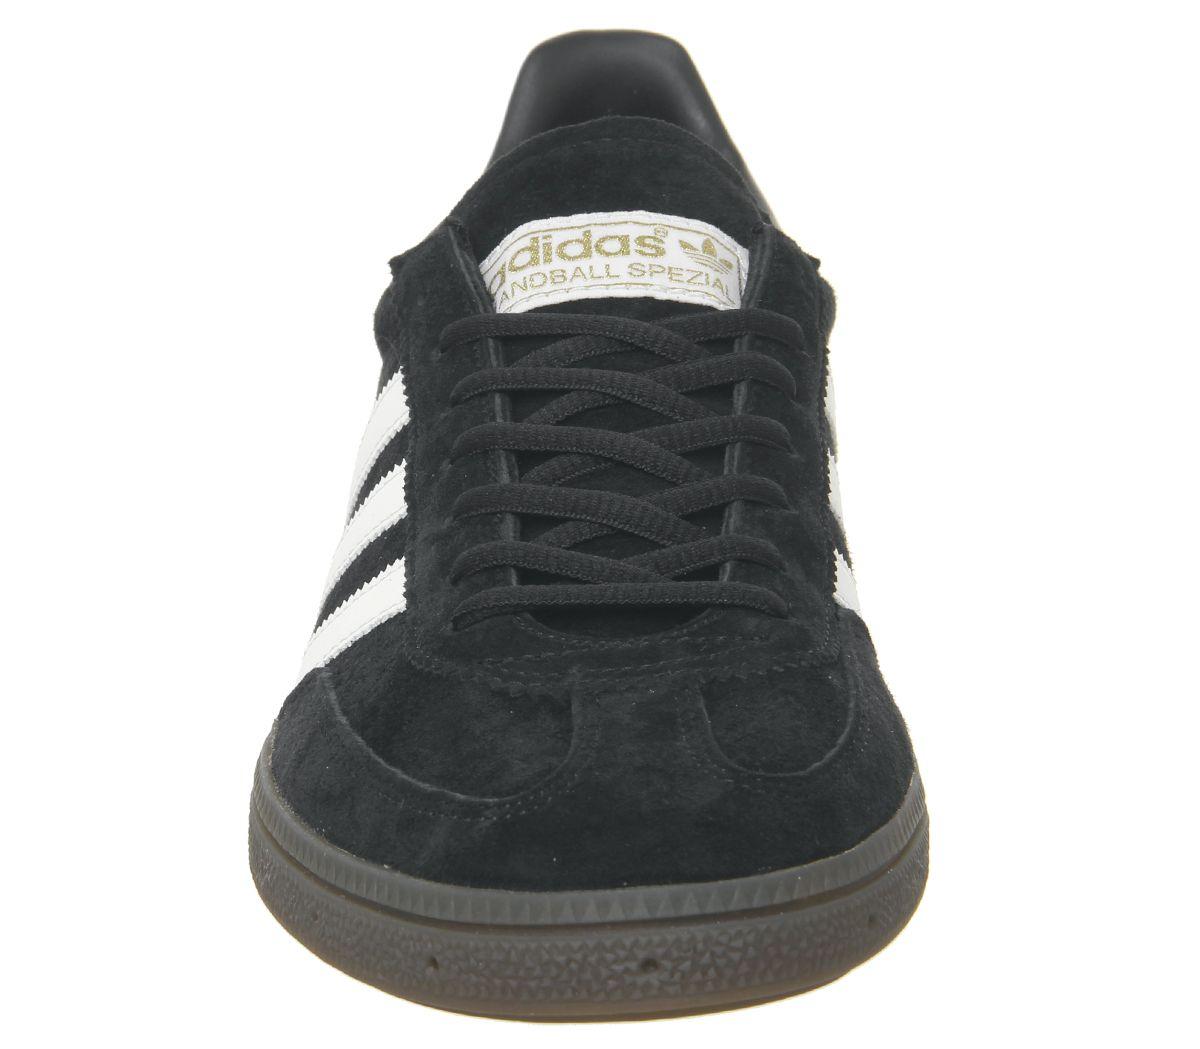 Adidas-Handball-Spezial-Trainers-Core-Black-White-Gum-Trainers-Shoes thumbnail 6